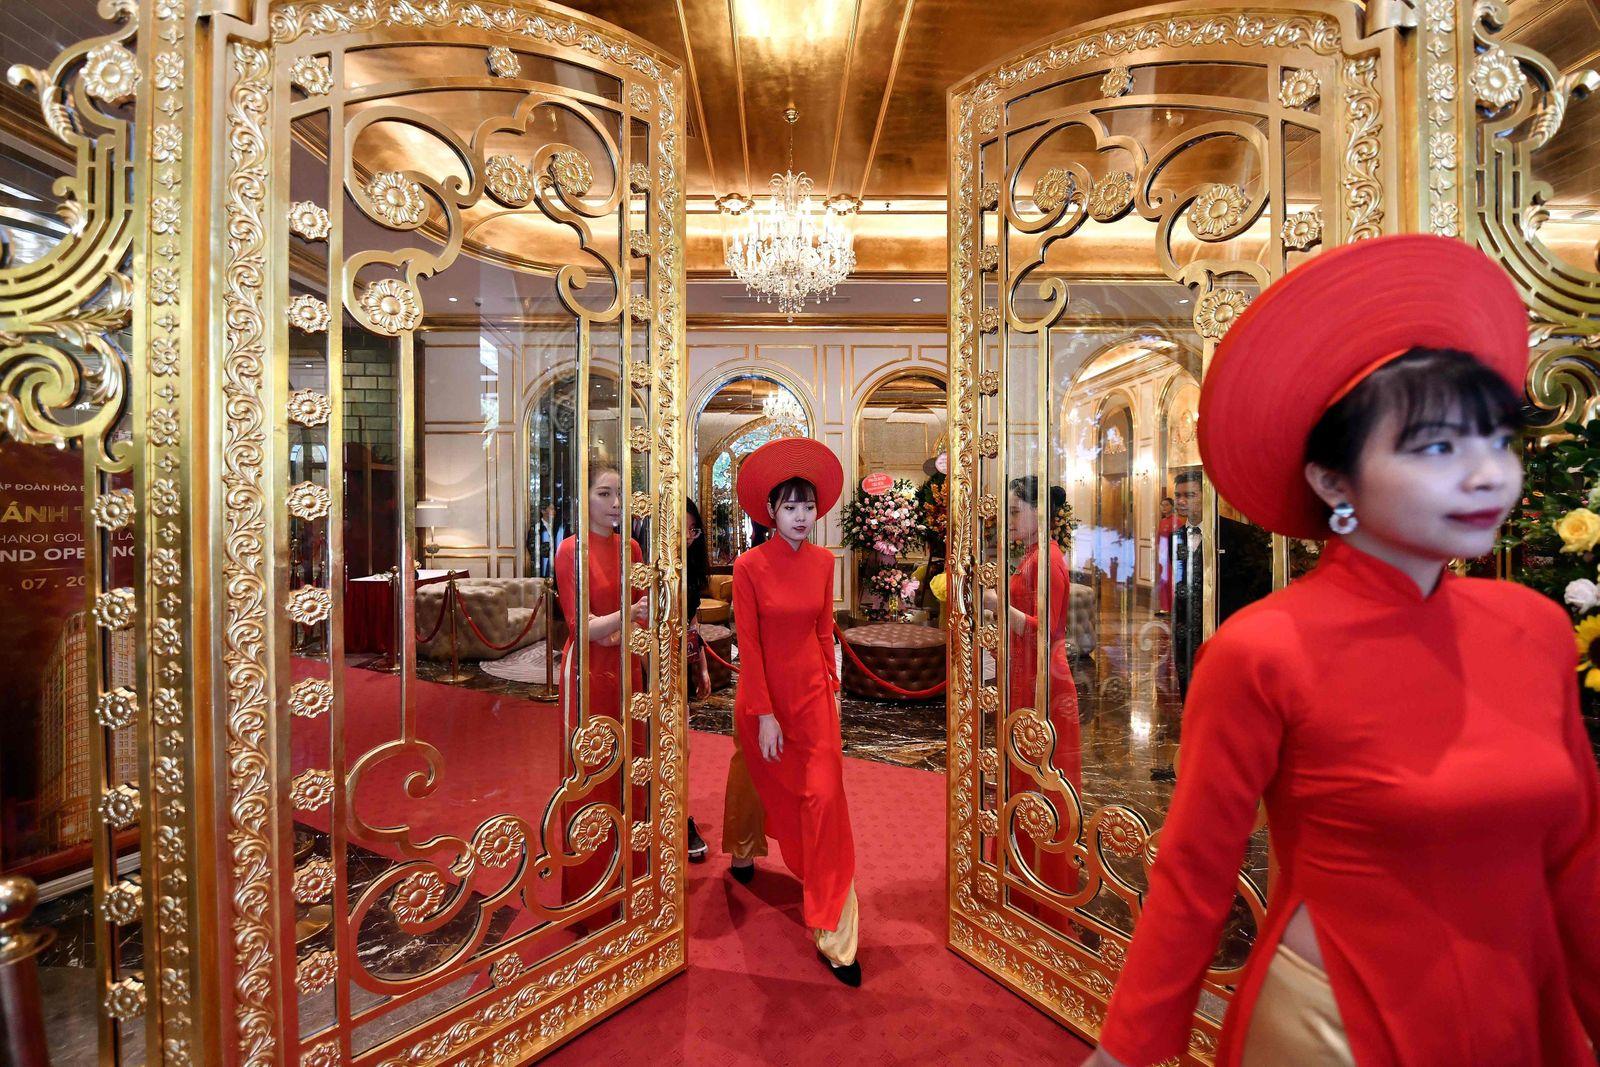 TOPSHOT-VIETNAM-ECONOMY-LUXURY-GOLD-HOTEL